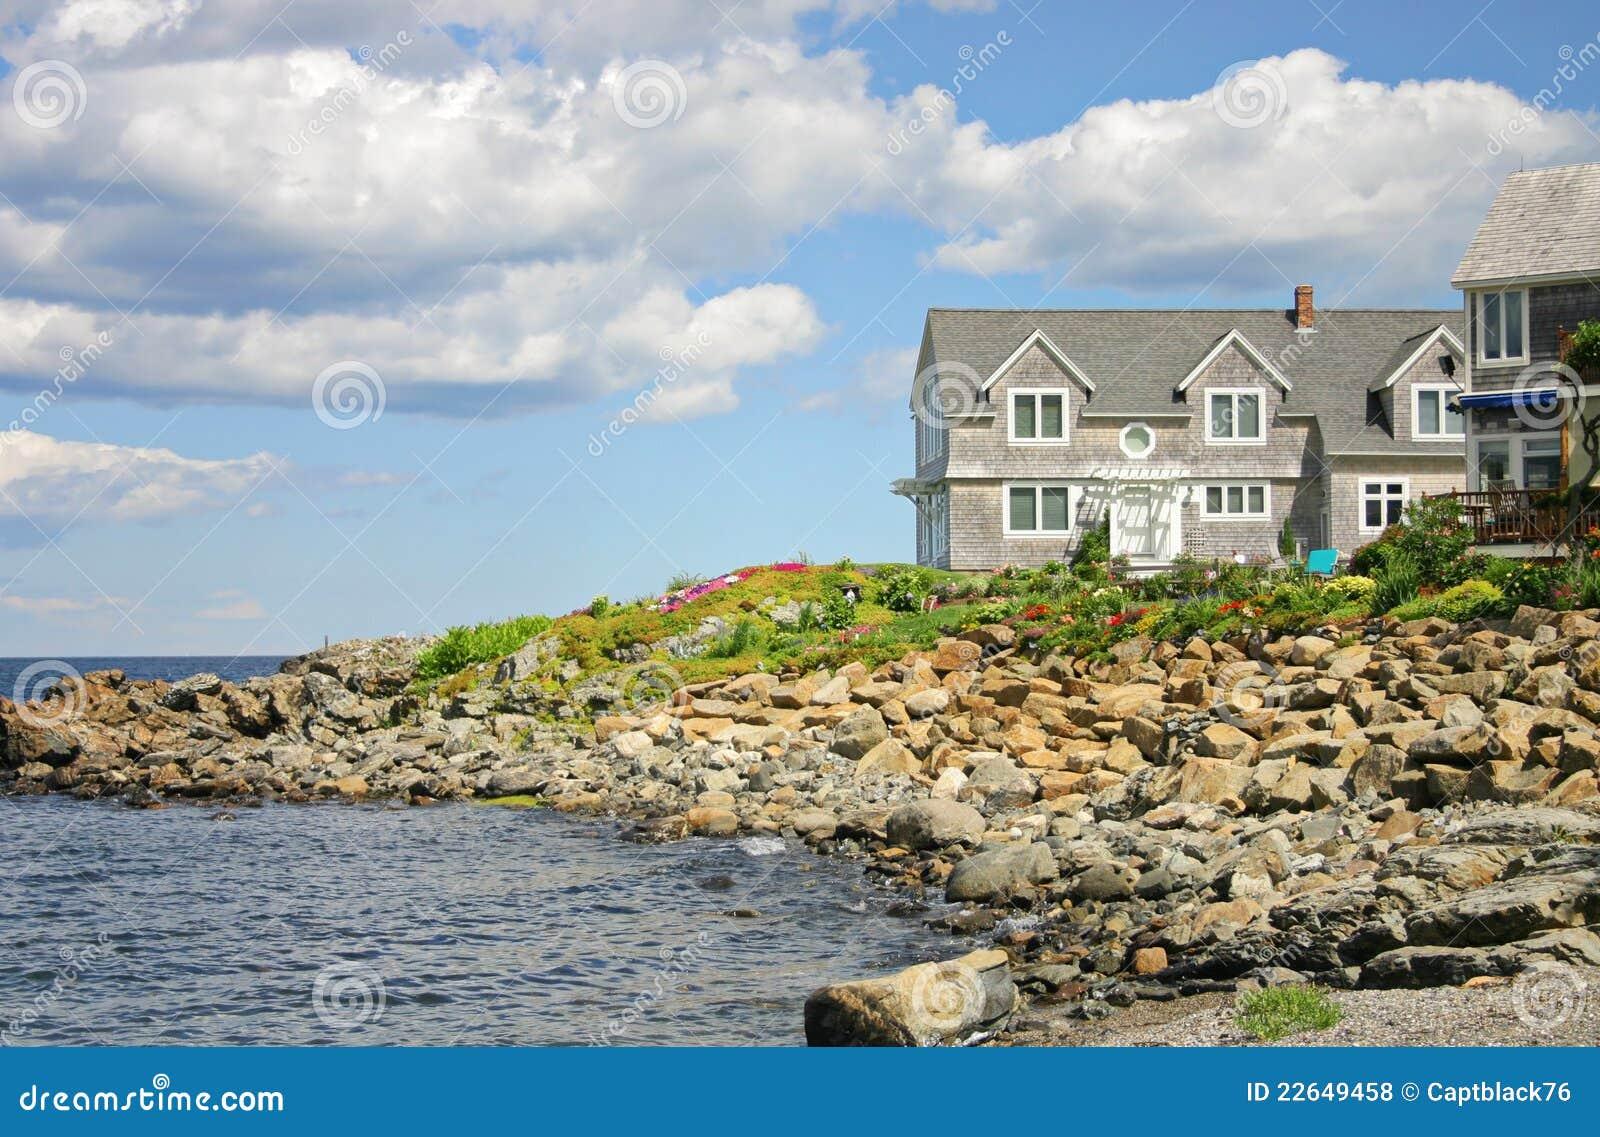 home near the sea royalty free stock photos image 22649458